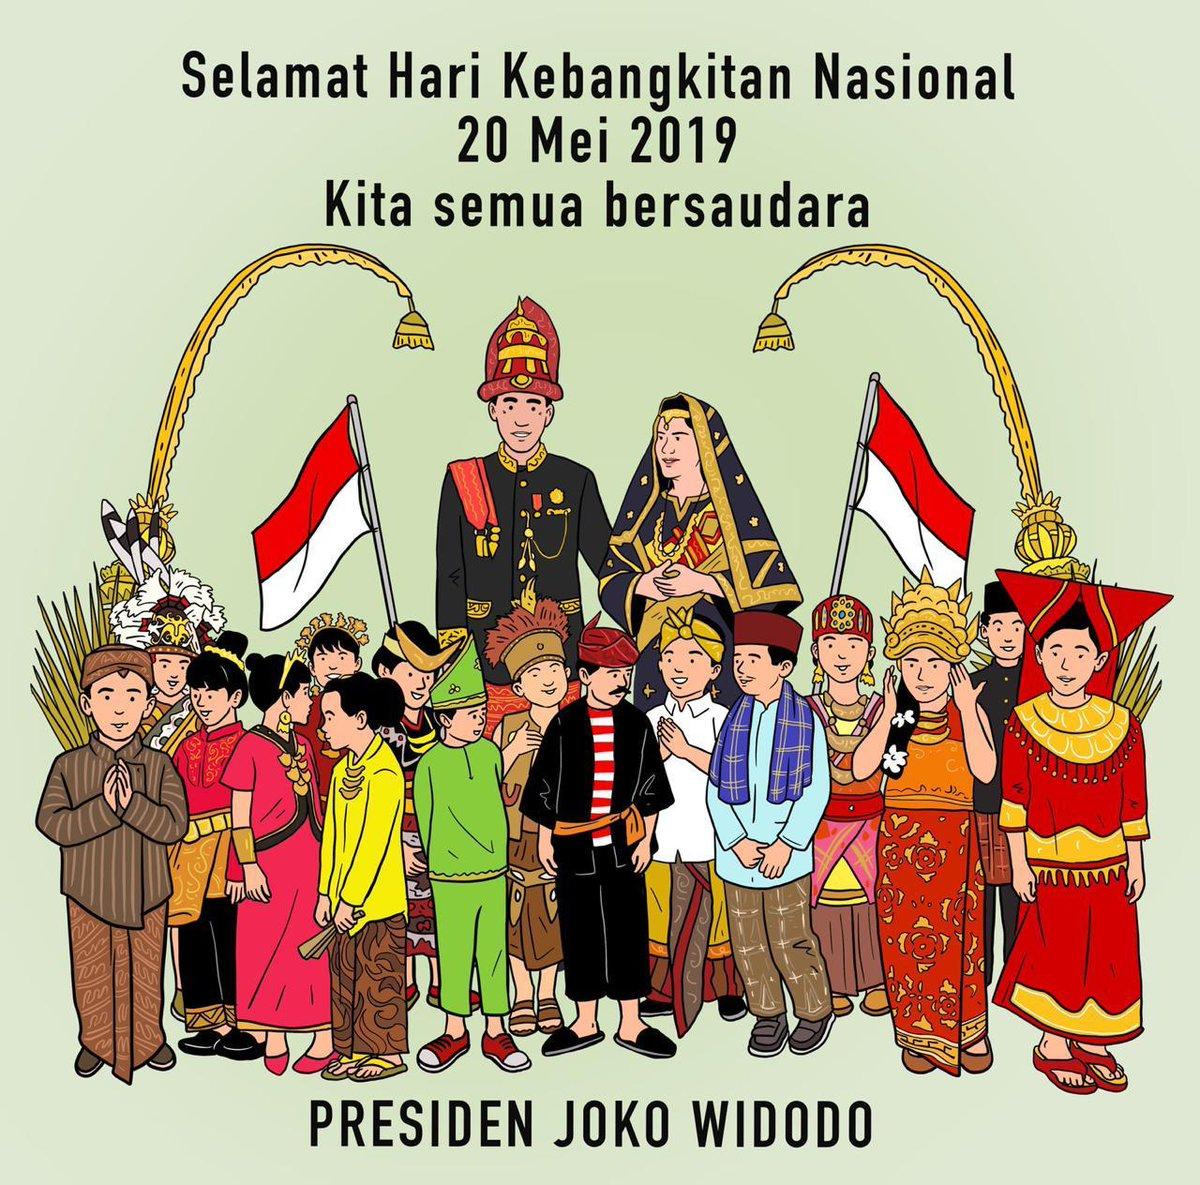 111 tahun lalu, para pemuda menolak terlelap dalam keterbelakangan. Mereka bangkit, memperkuat diri, mendirikan Budi Utomo, dll.  Kebangkitan itu kita peringati kini dengan tekad baru: membangun Indonesia yang maju, yang sanggup mengelola perbedaan, damai dan tanpa kekerasan.